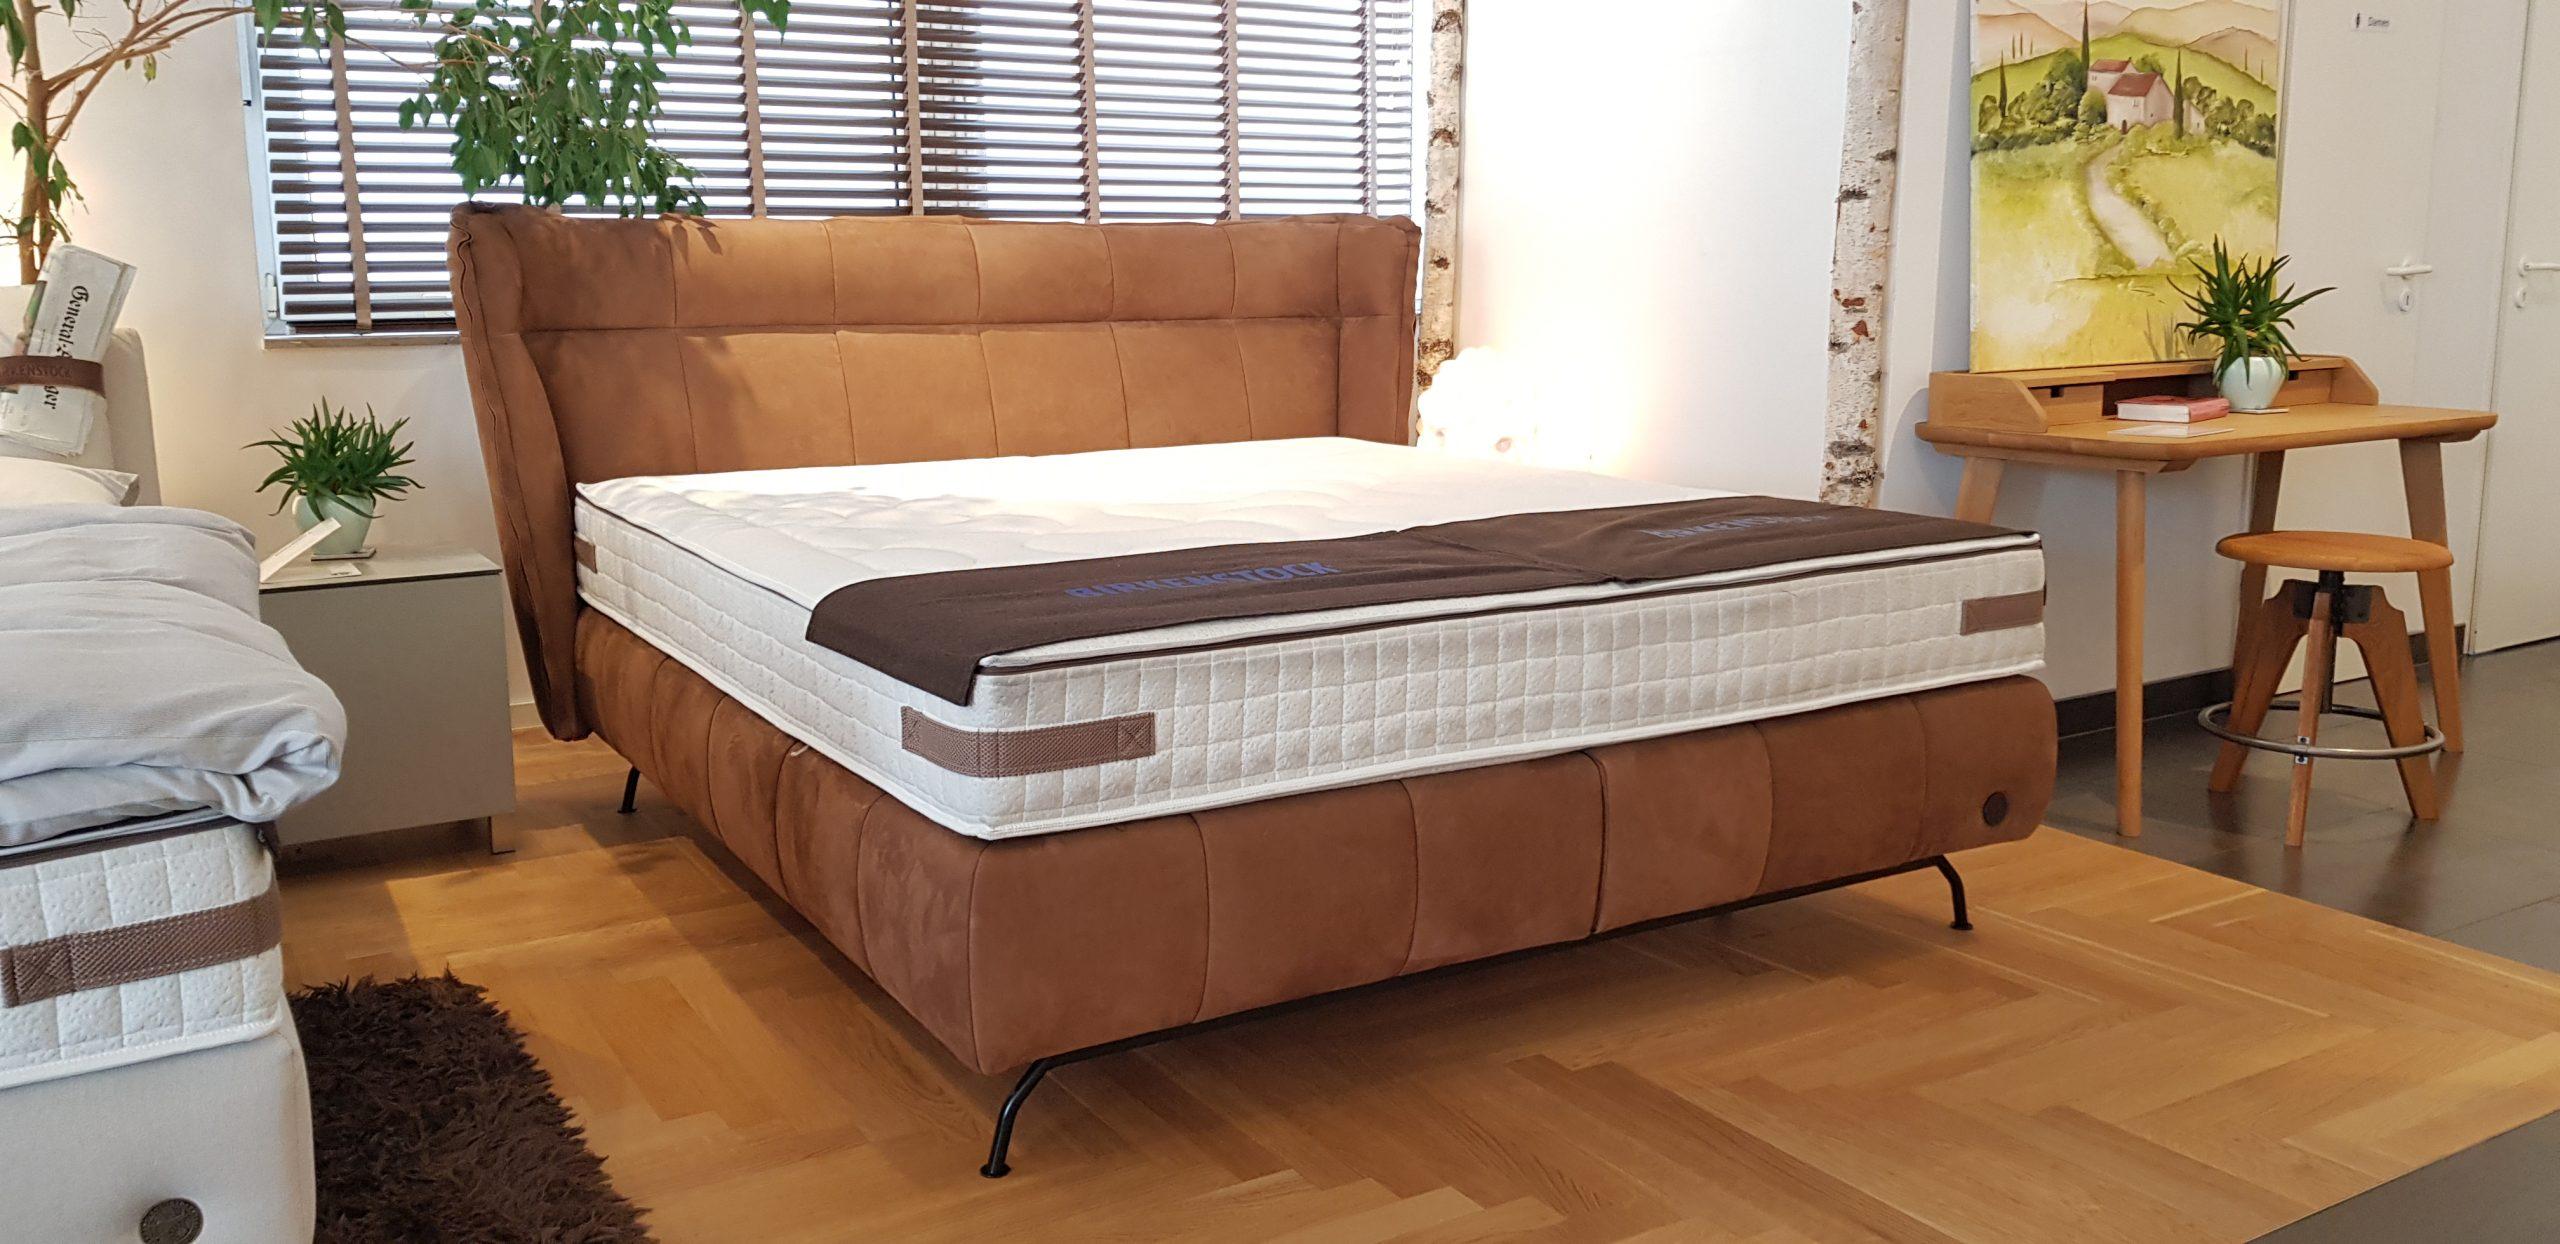 Full Size of Birkenstock Basel Luxury Boxspring Sleeping Art Bonn Bett Weiß 120x200 Mit Matratze Und Lattenrost Hasena Runde Betten Altes 200x220 Möbel Boss Aus Paletten Bett Bett Ausstellungsstück